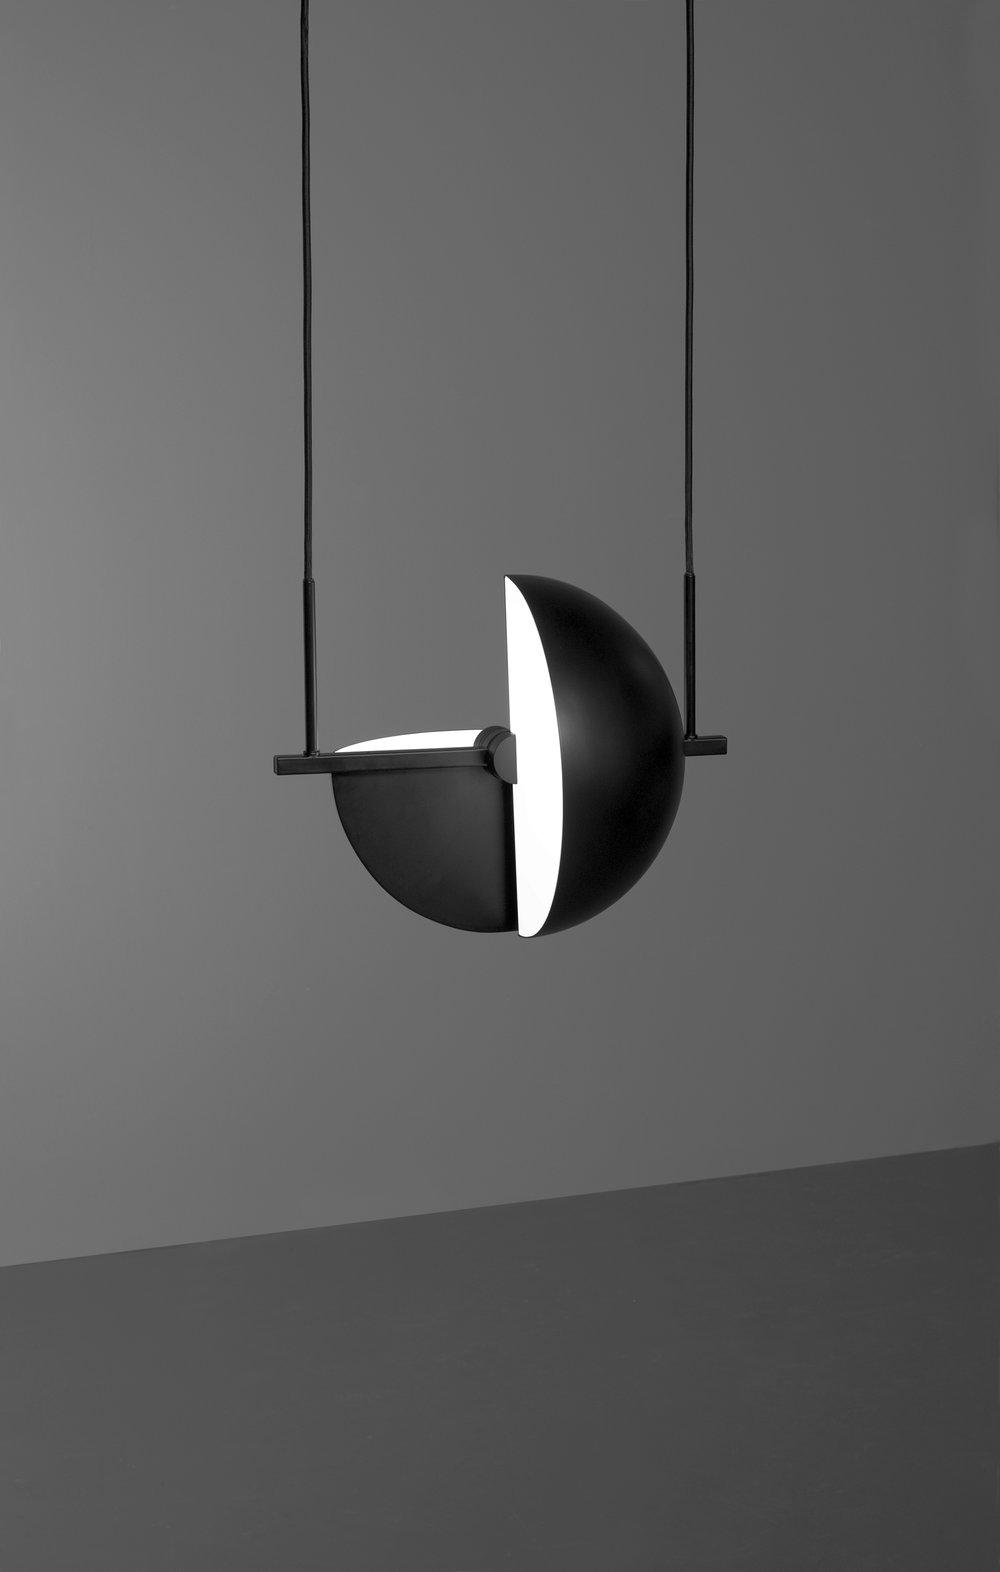 Trapeze Pendant by Jette Scheib for Oblure 1.jpg